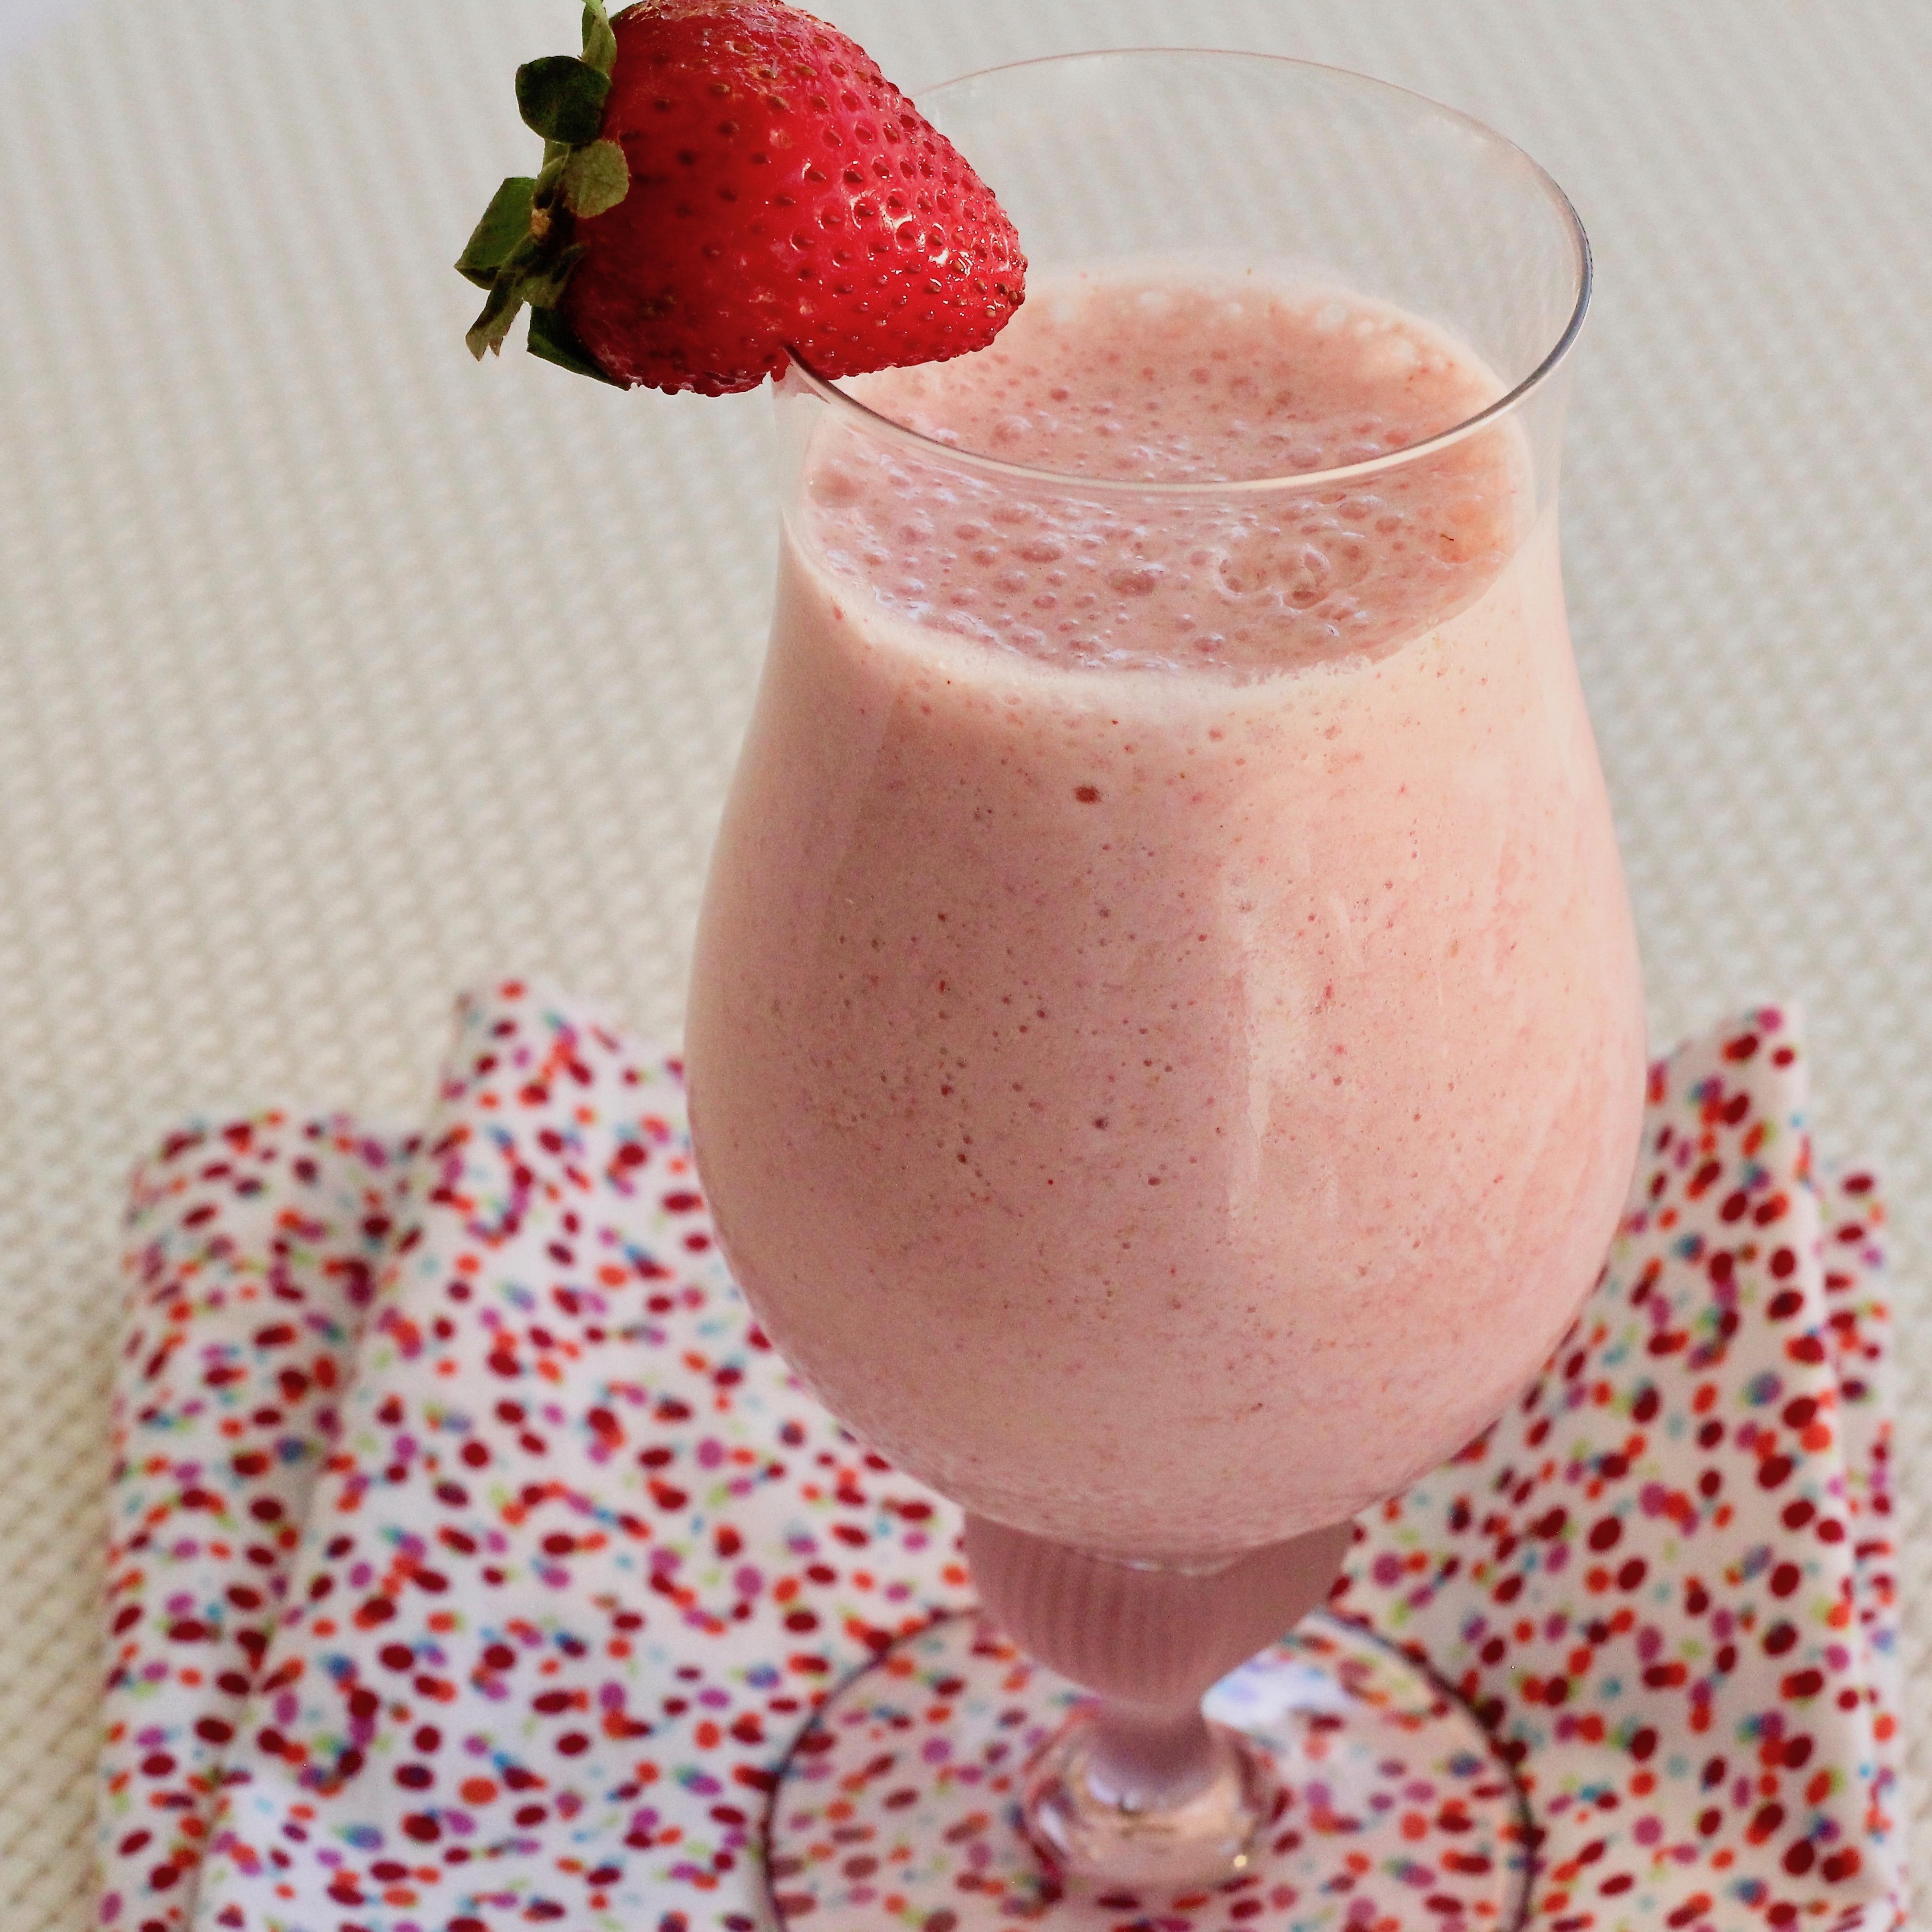 Delicious Healthy Strawberry Shake